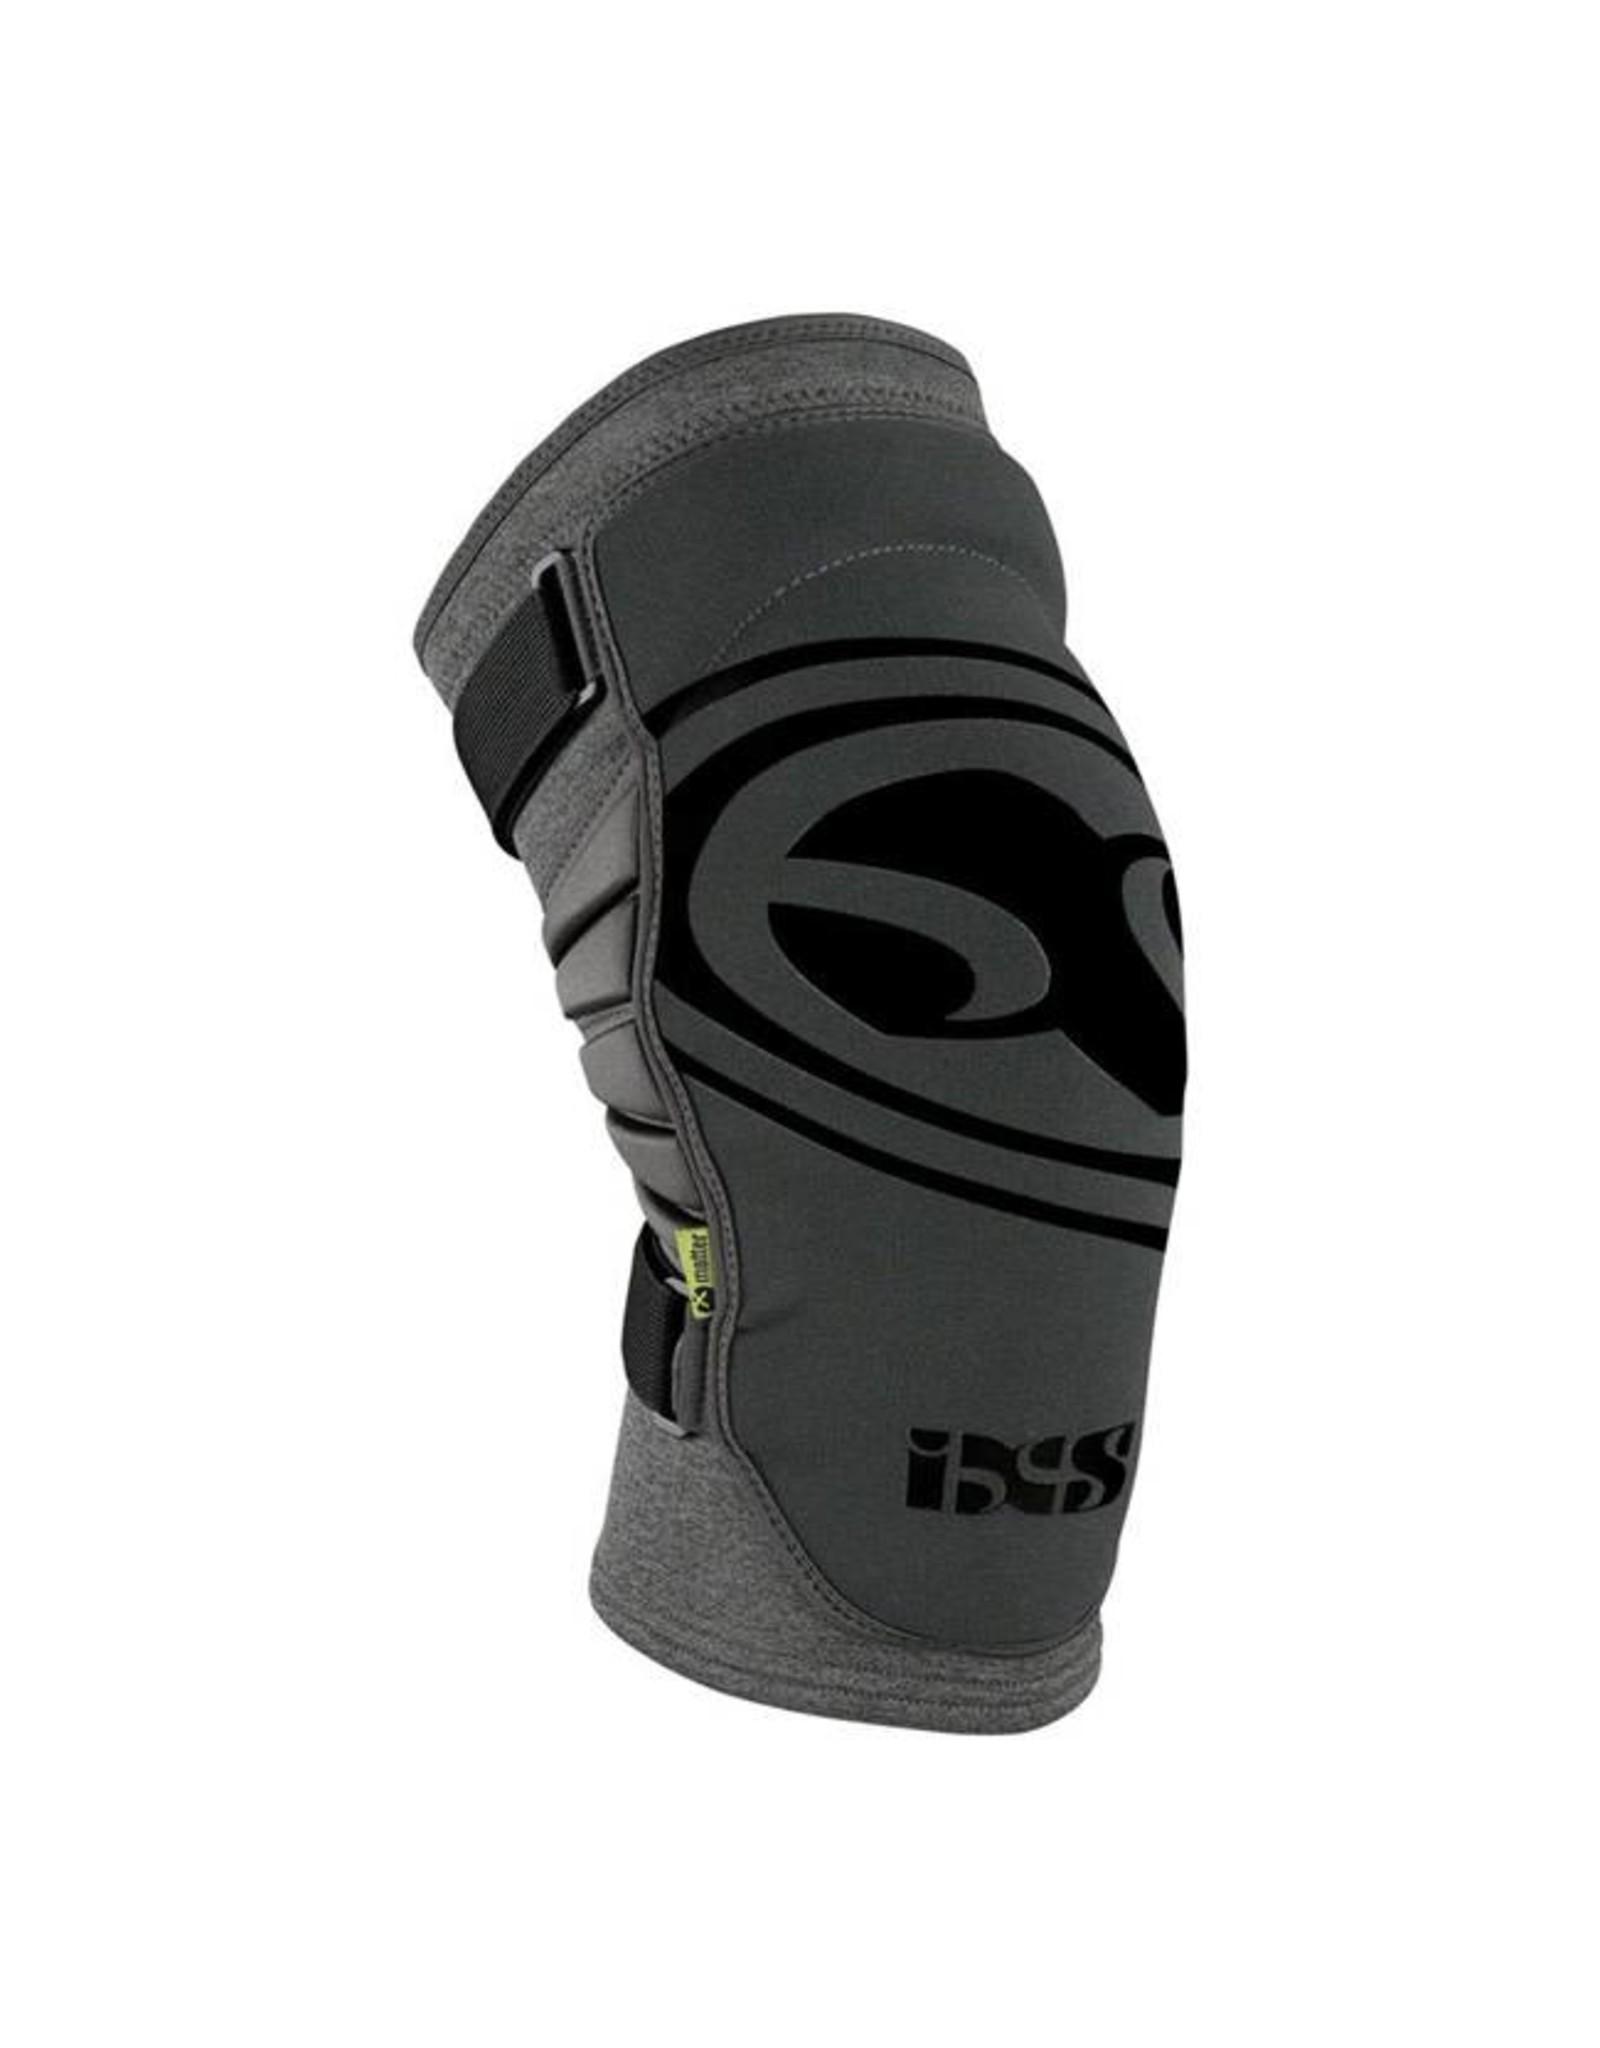 IXS iXS Carve Evo+ Knee Pads: Gray LG